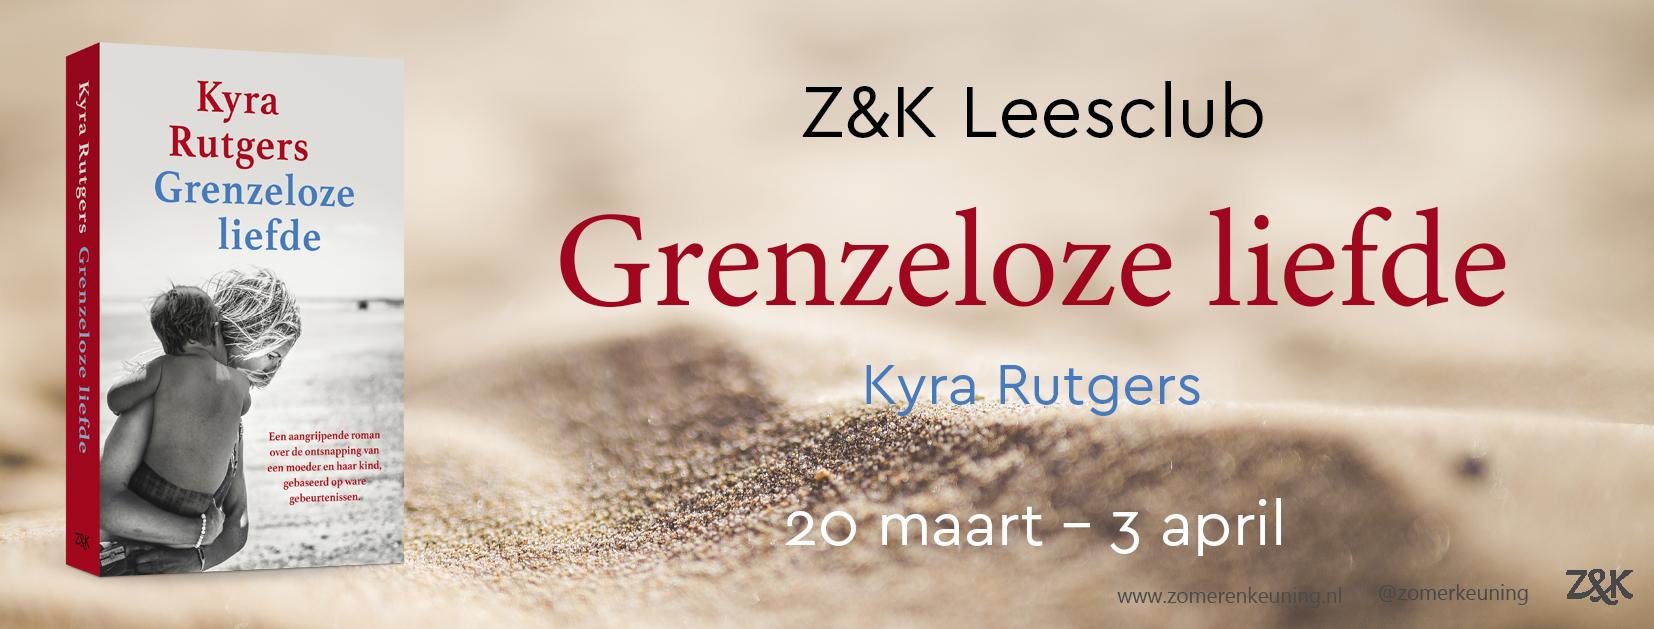 Z&K leesclub Grenzeloze liefde 20 maart - 3 april